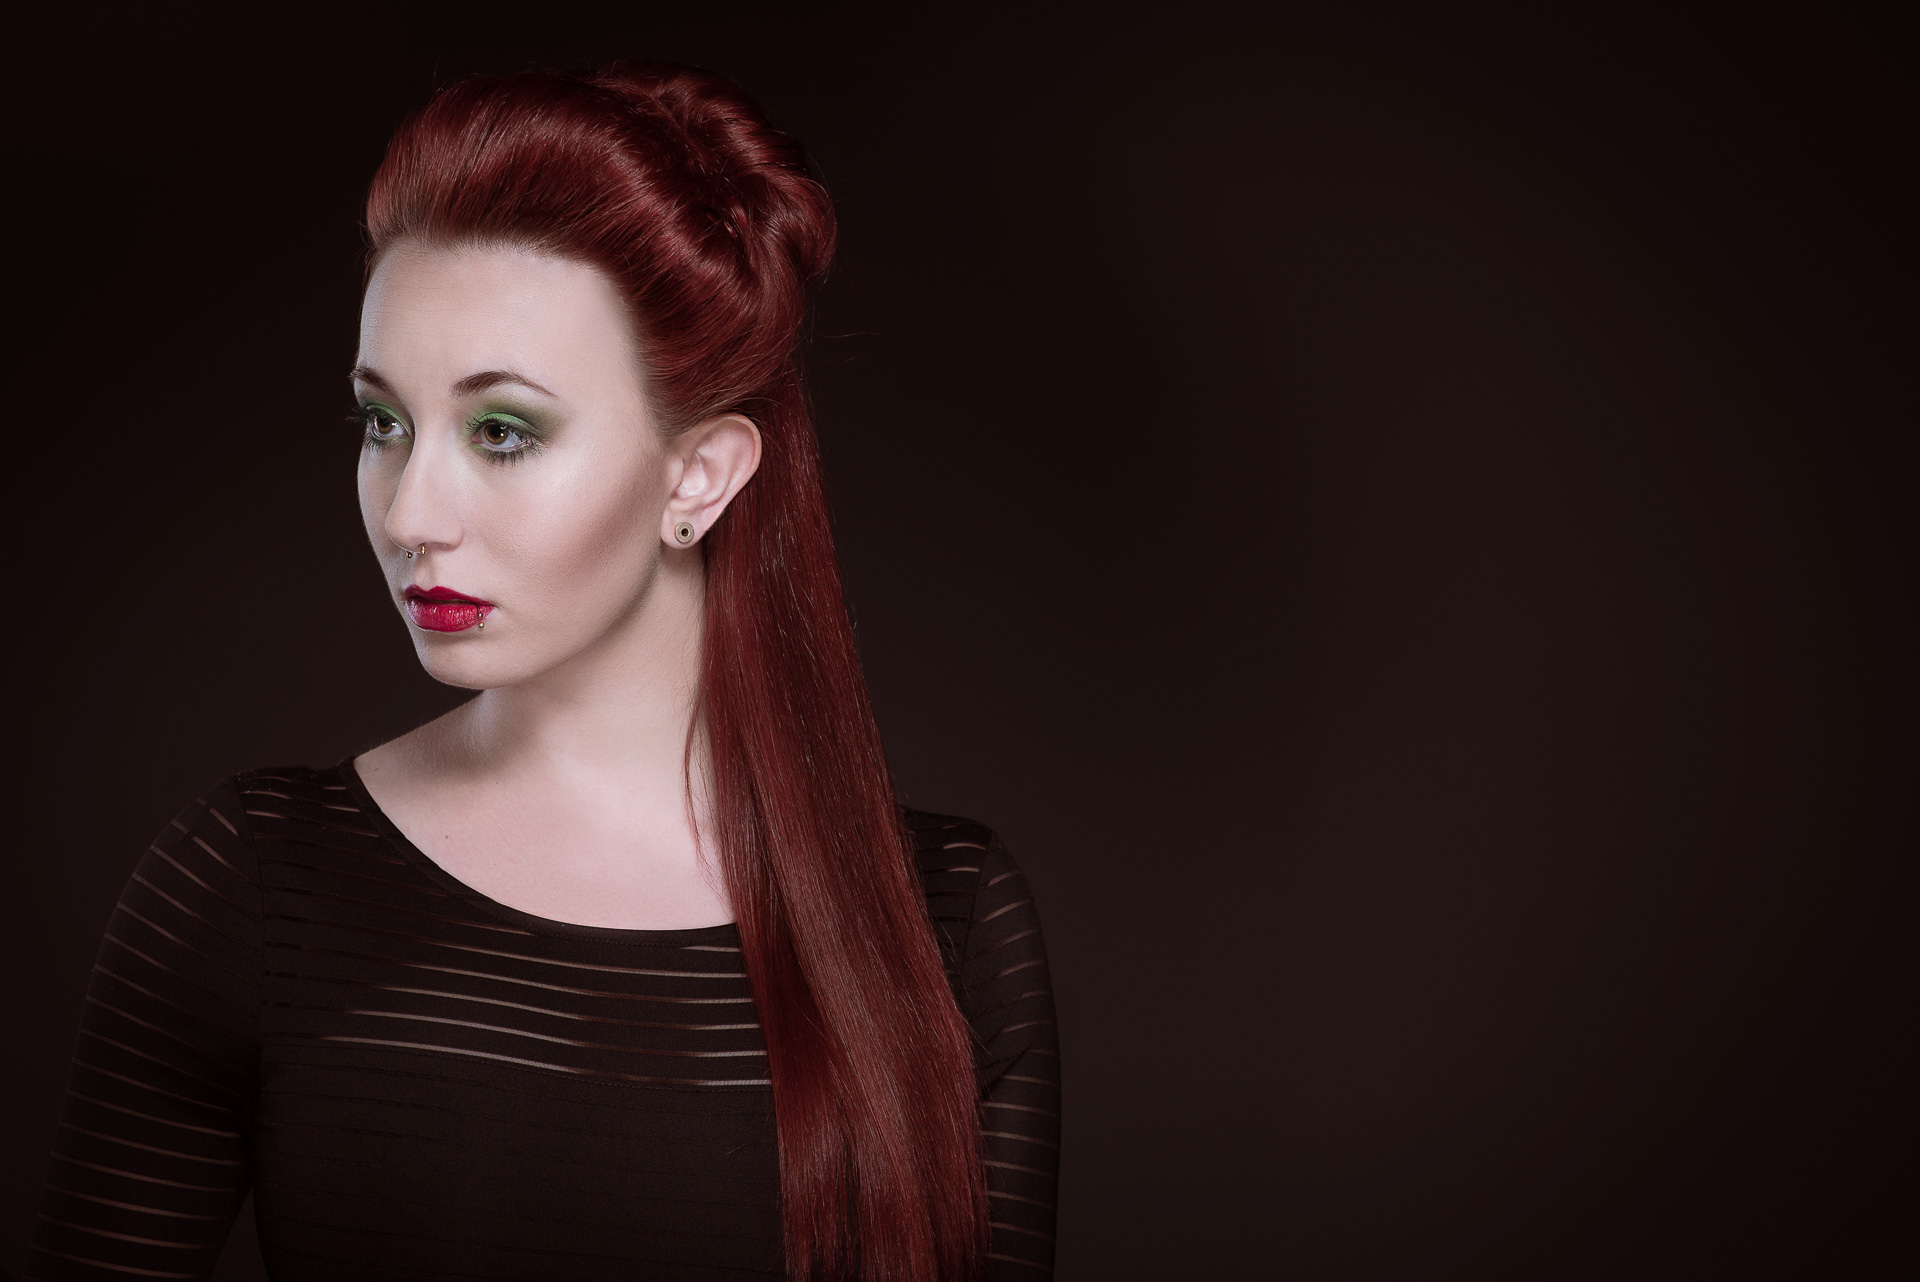 Hair & Make up Artist nähe Mainz,FFM